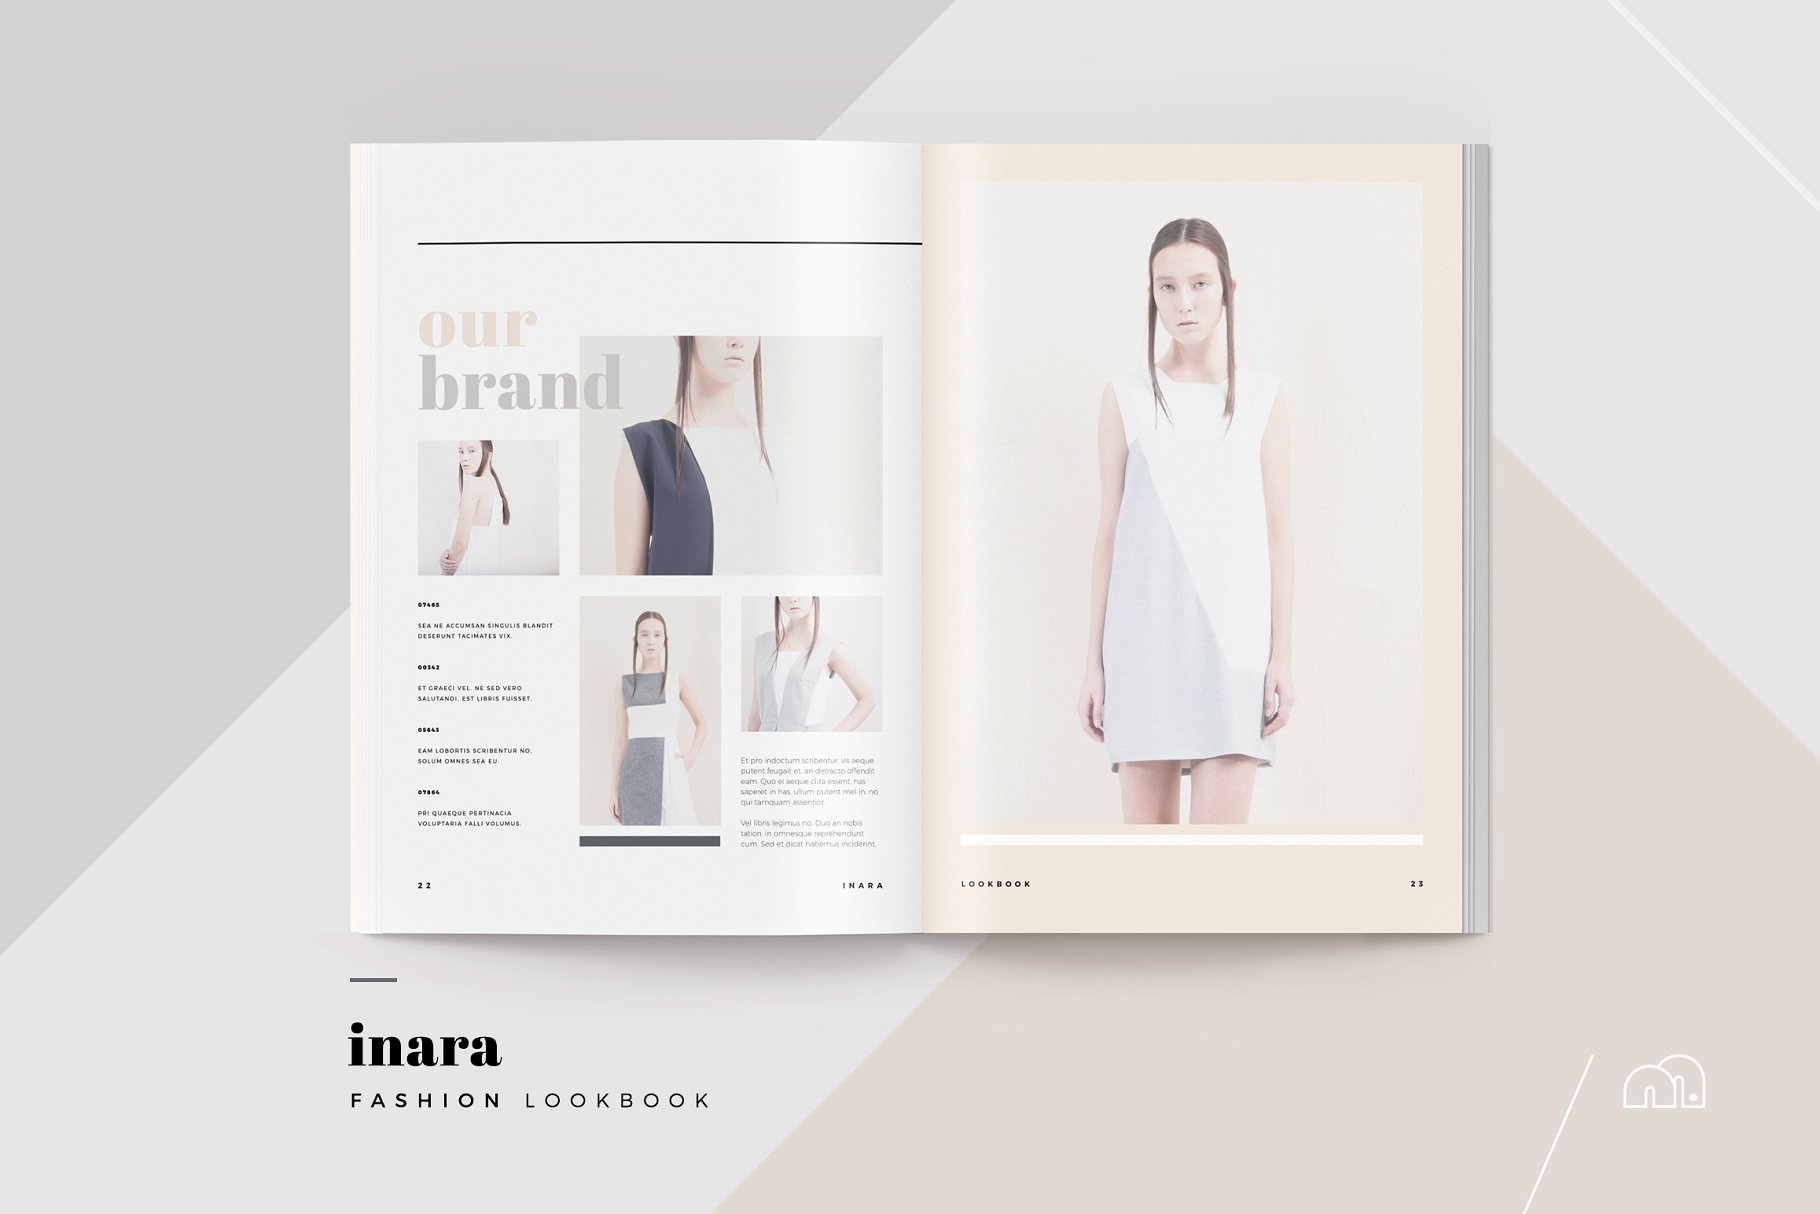 lookbook-inara-preview-2-.jpg